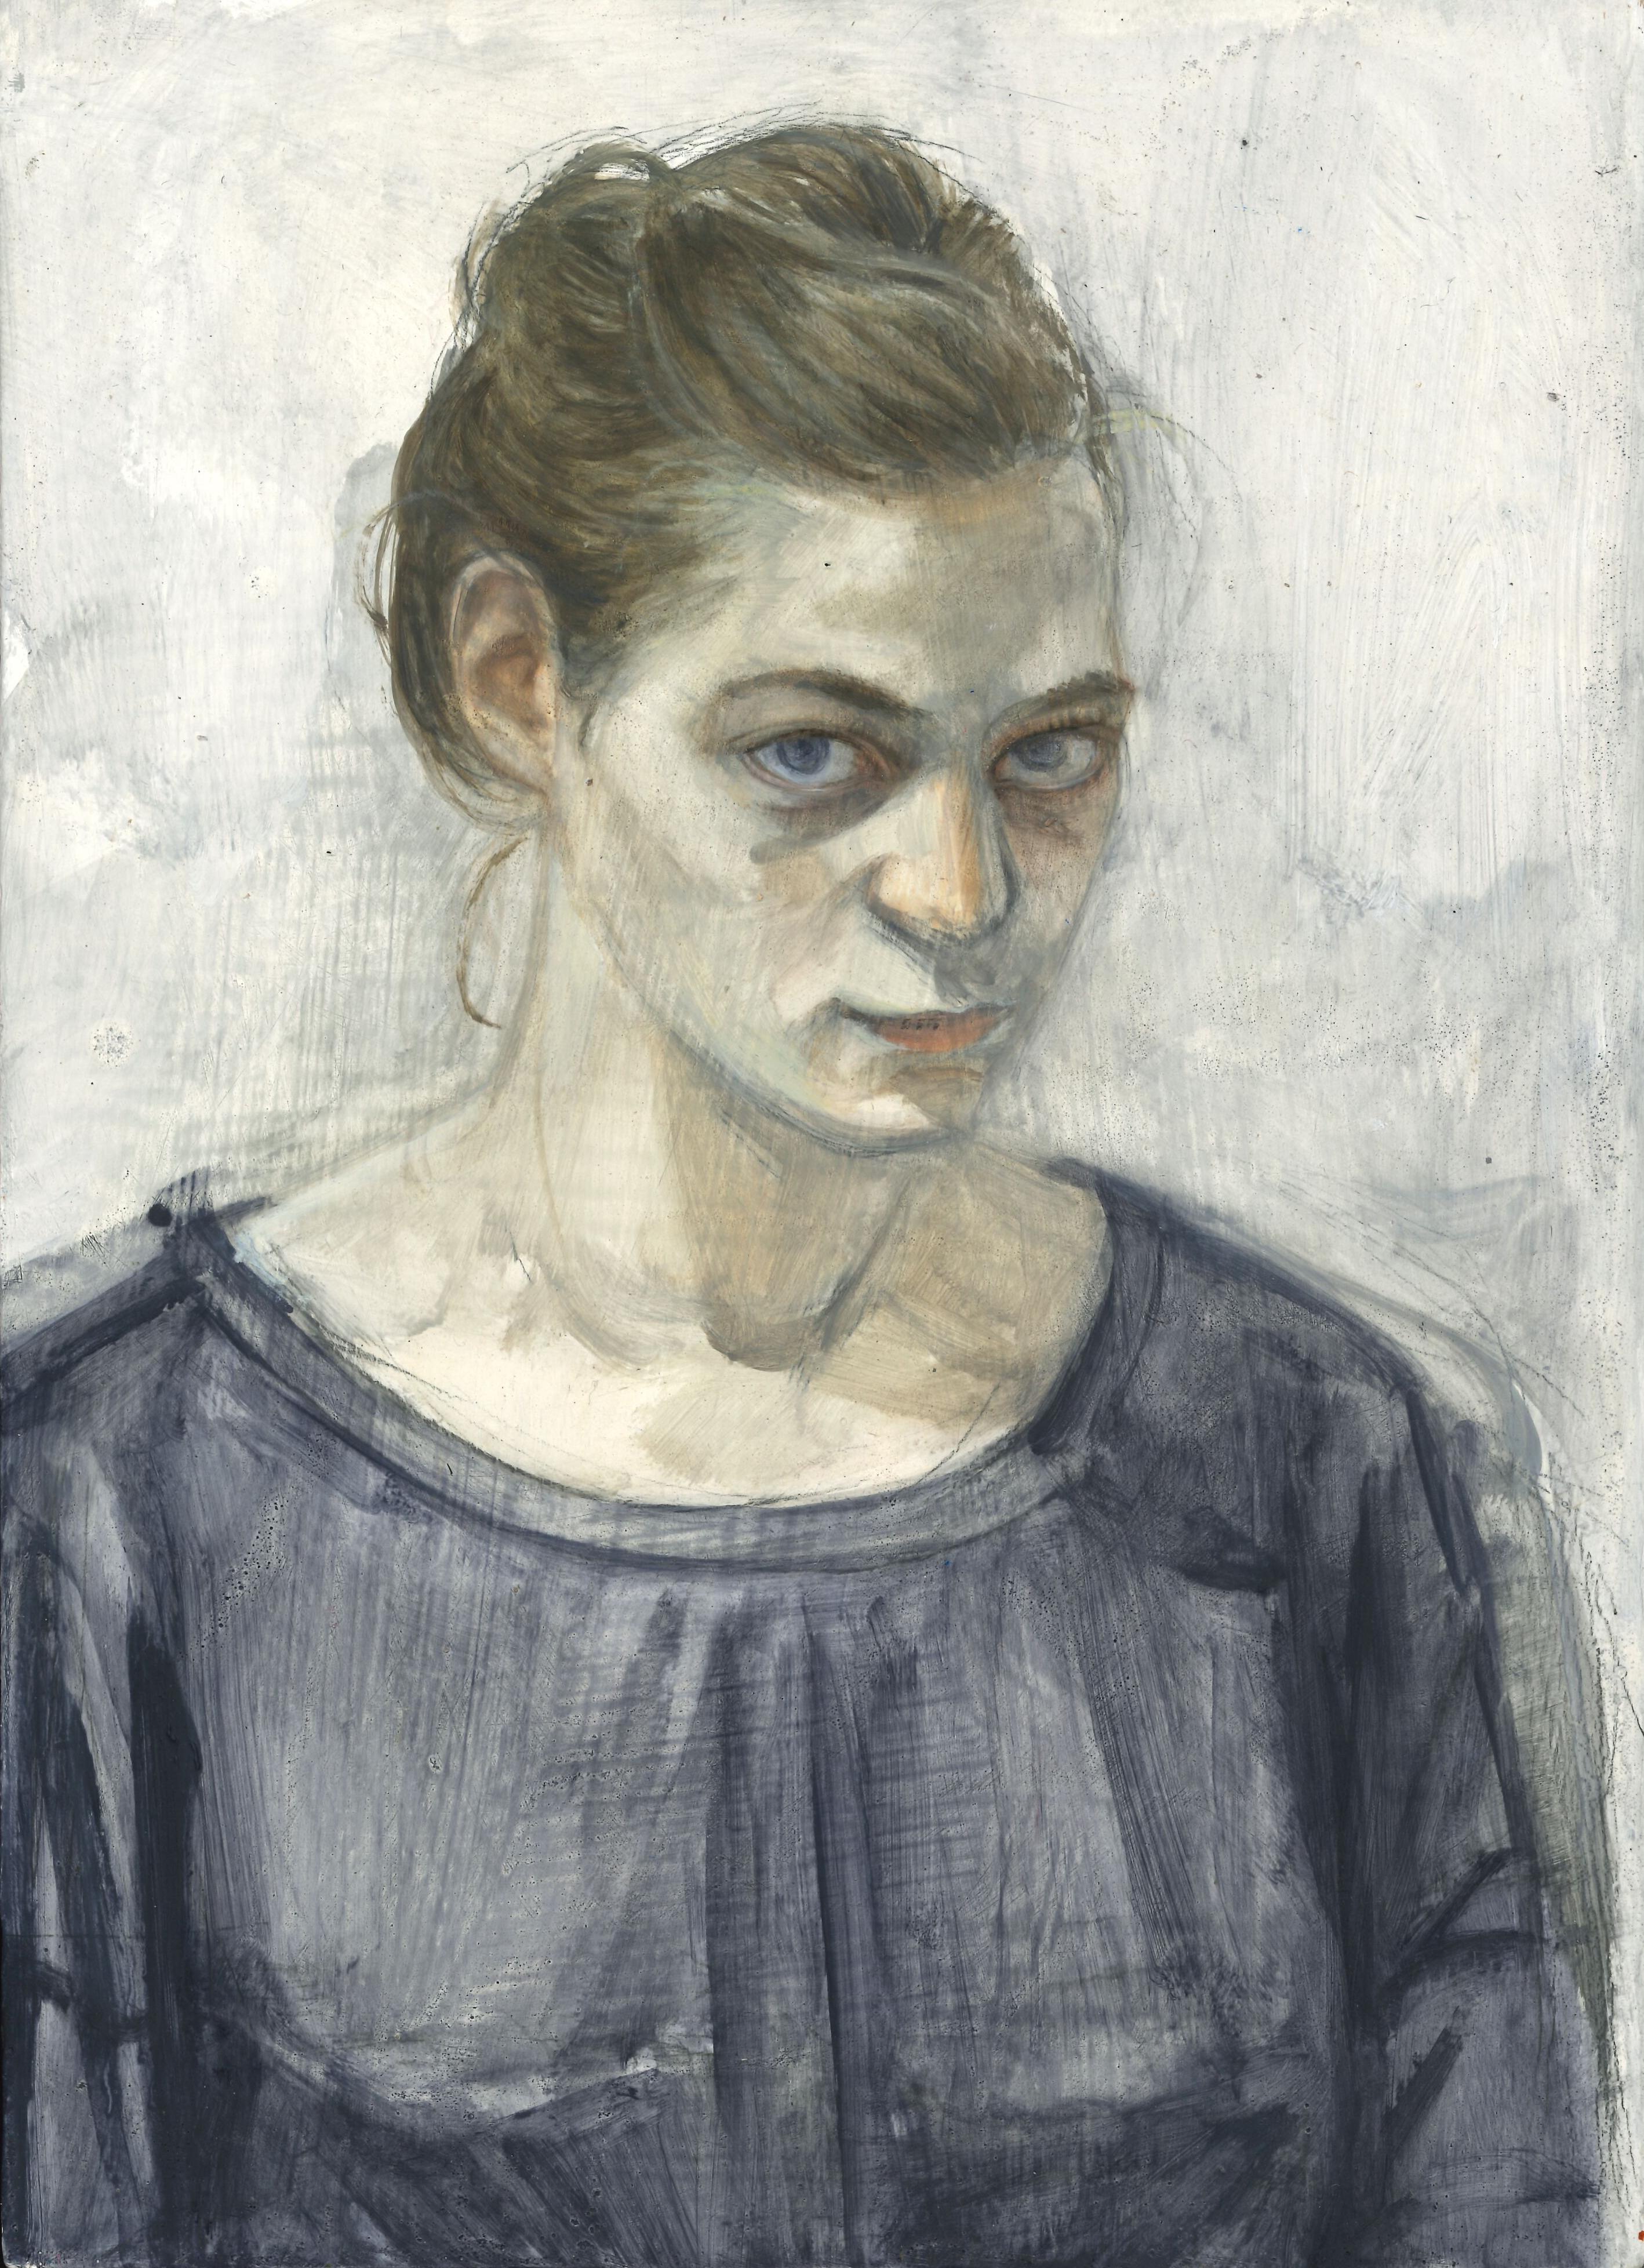 Roxanne, 2018, 32 x 40 cm, oil on wood